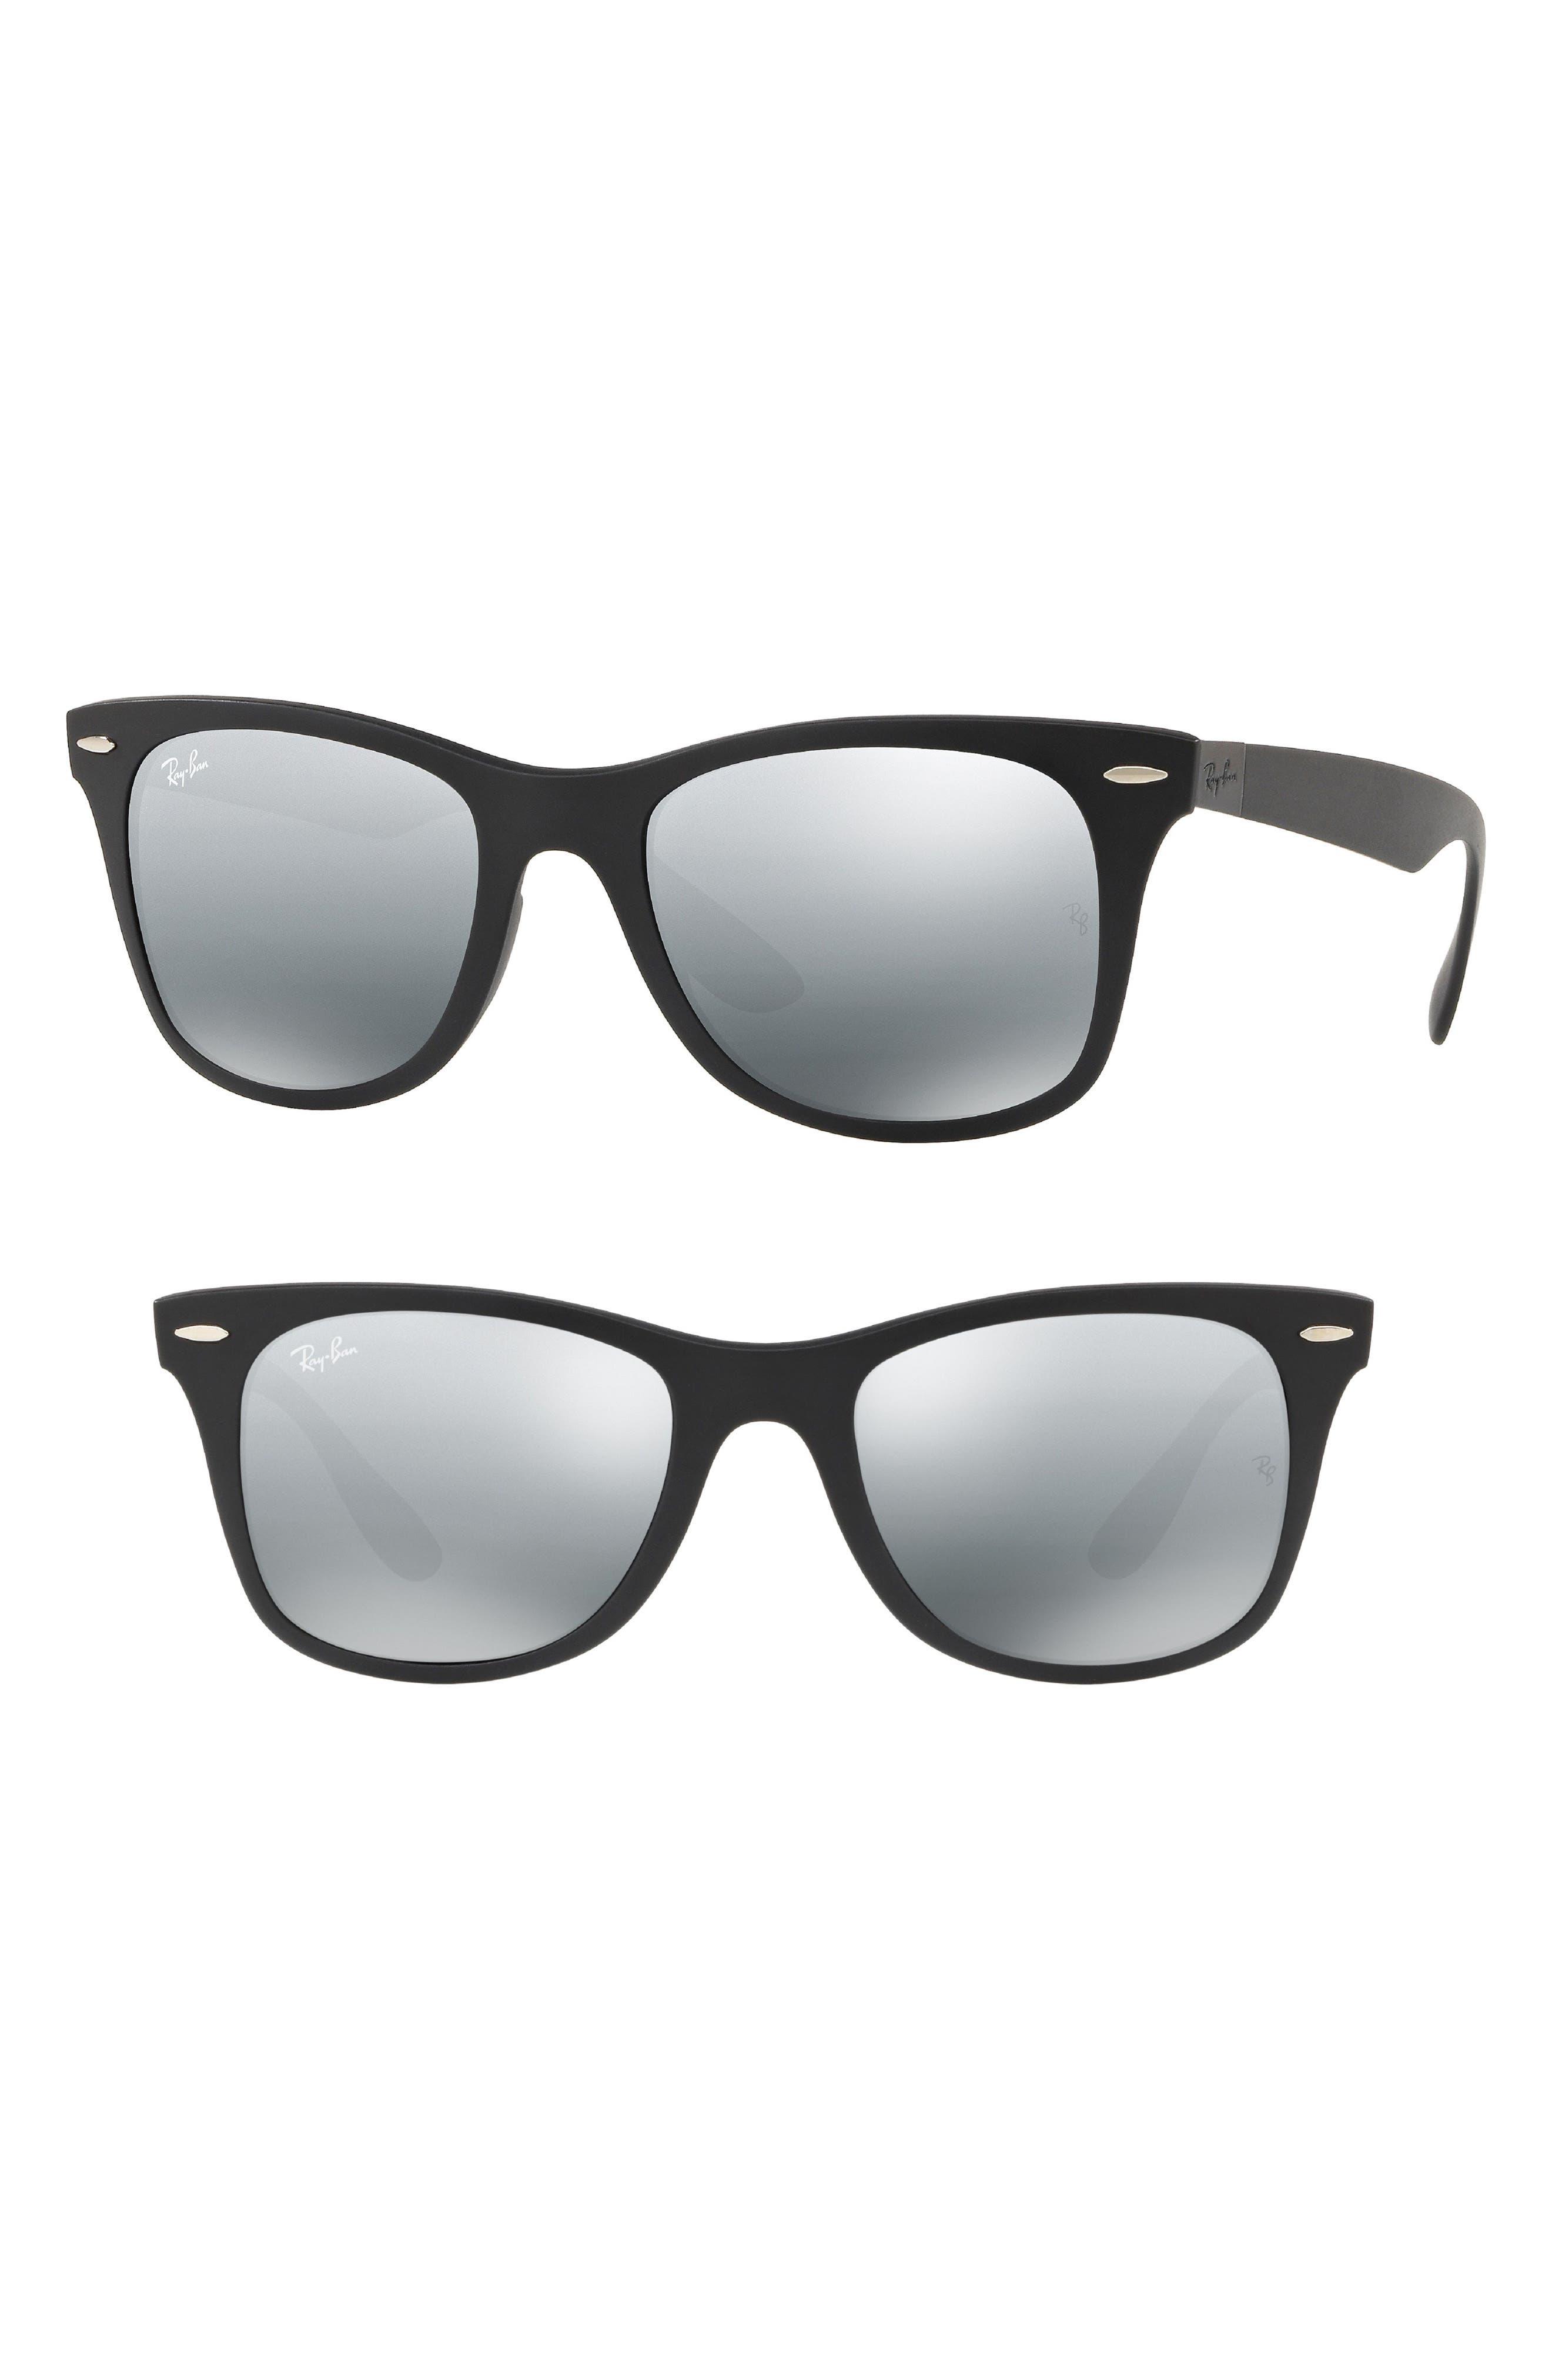 Ray-Ban Tech Wayfarer Liteforce 52mm Sunglasses